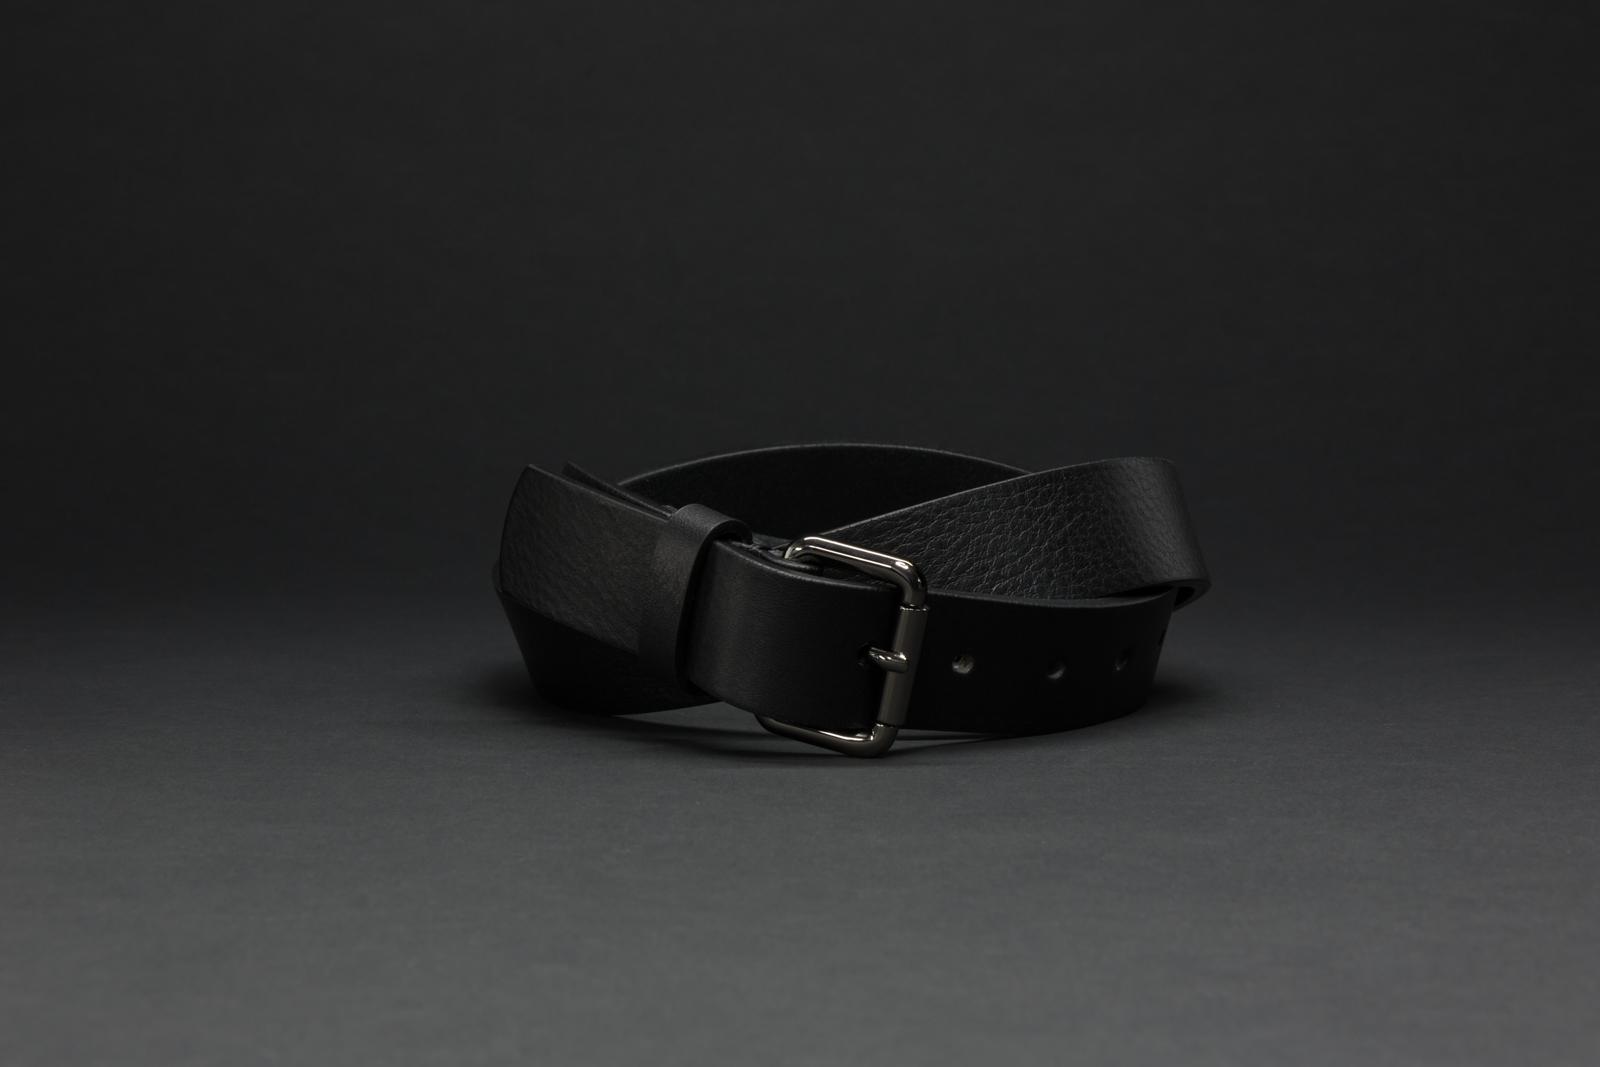 Aerogram Black Collection